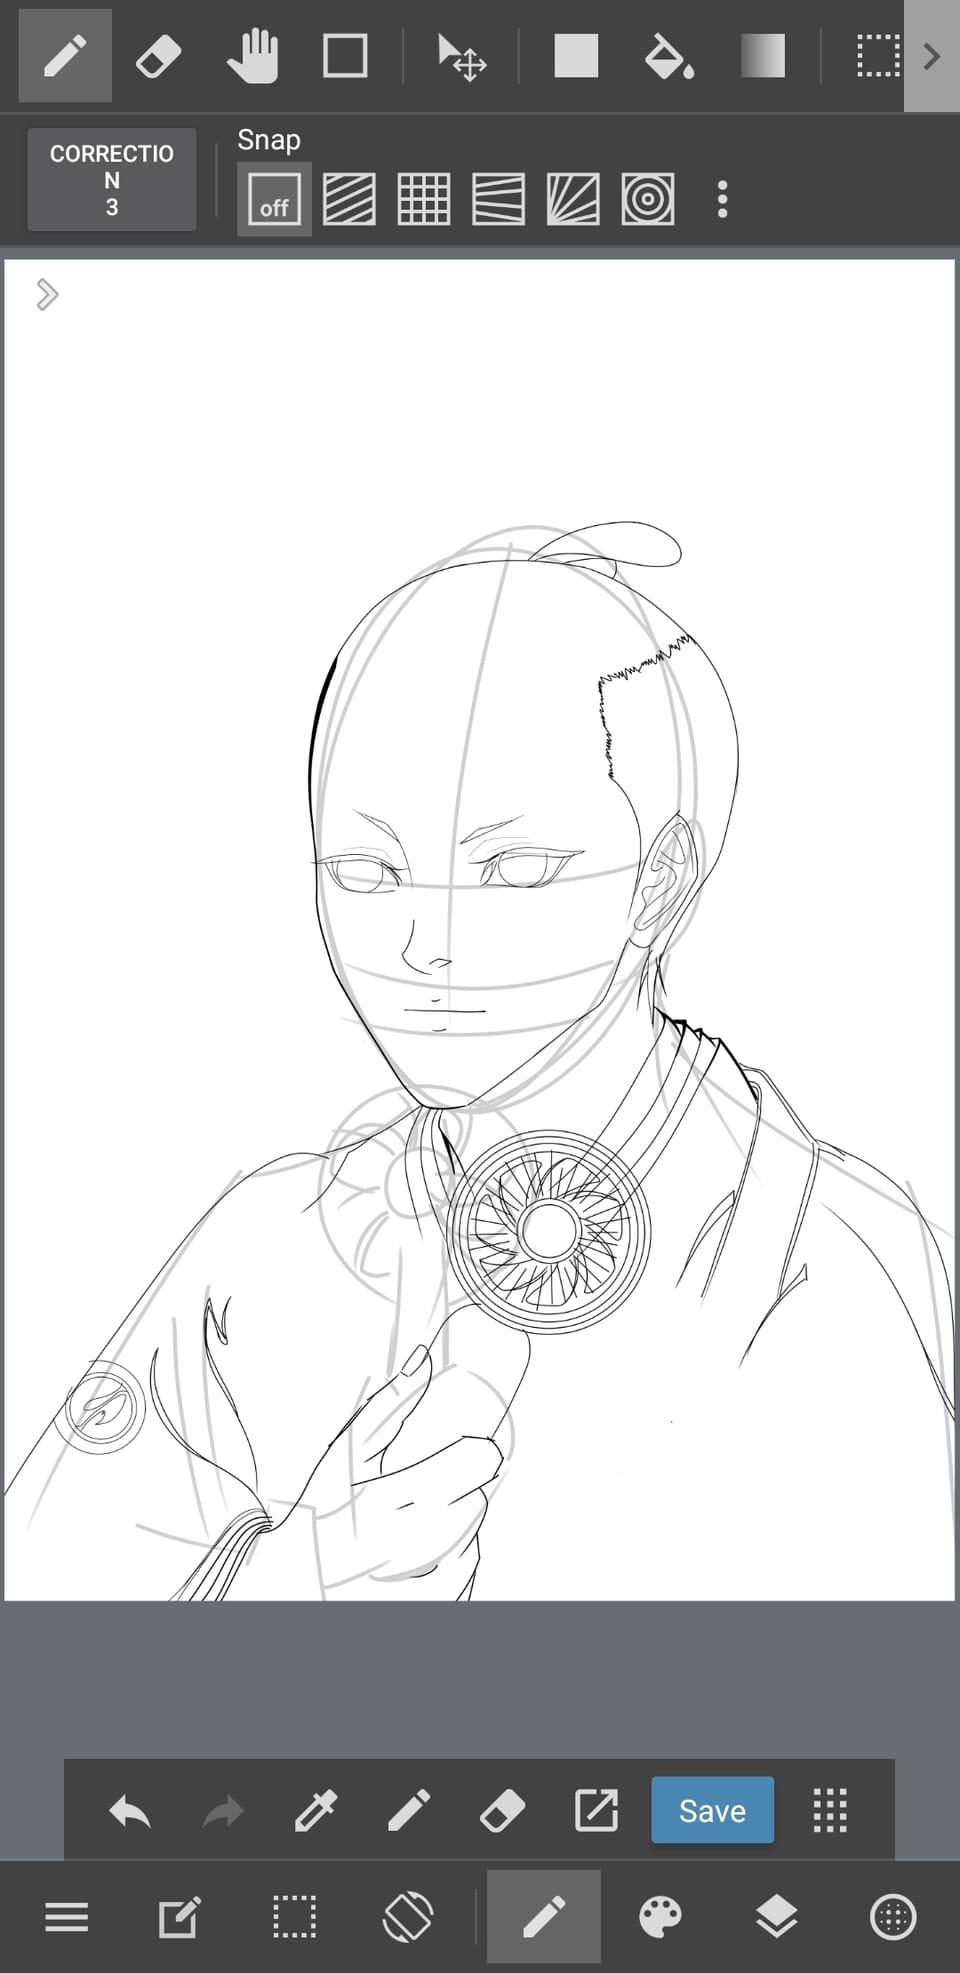 the way i draw! Illust of zozo fanart painting medibangpaint sketch drawing Japanese_style contest art illustration